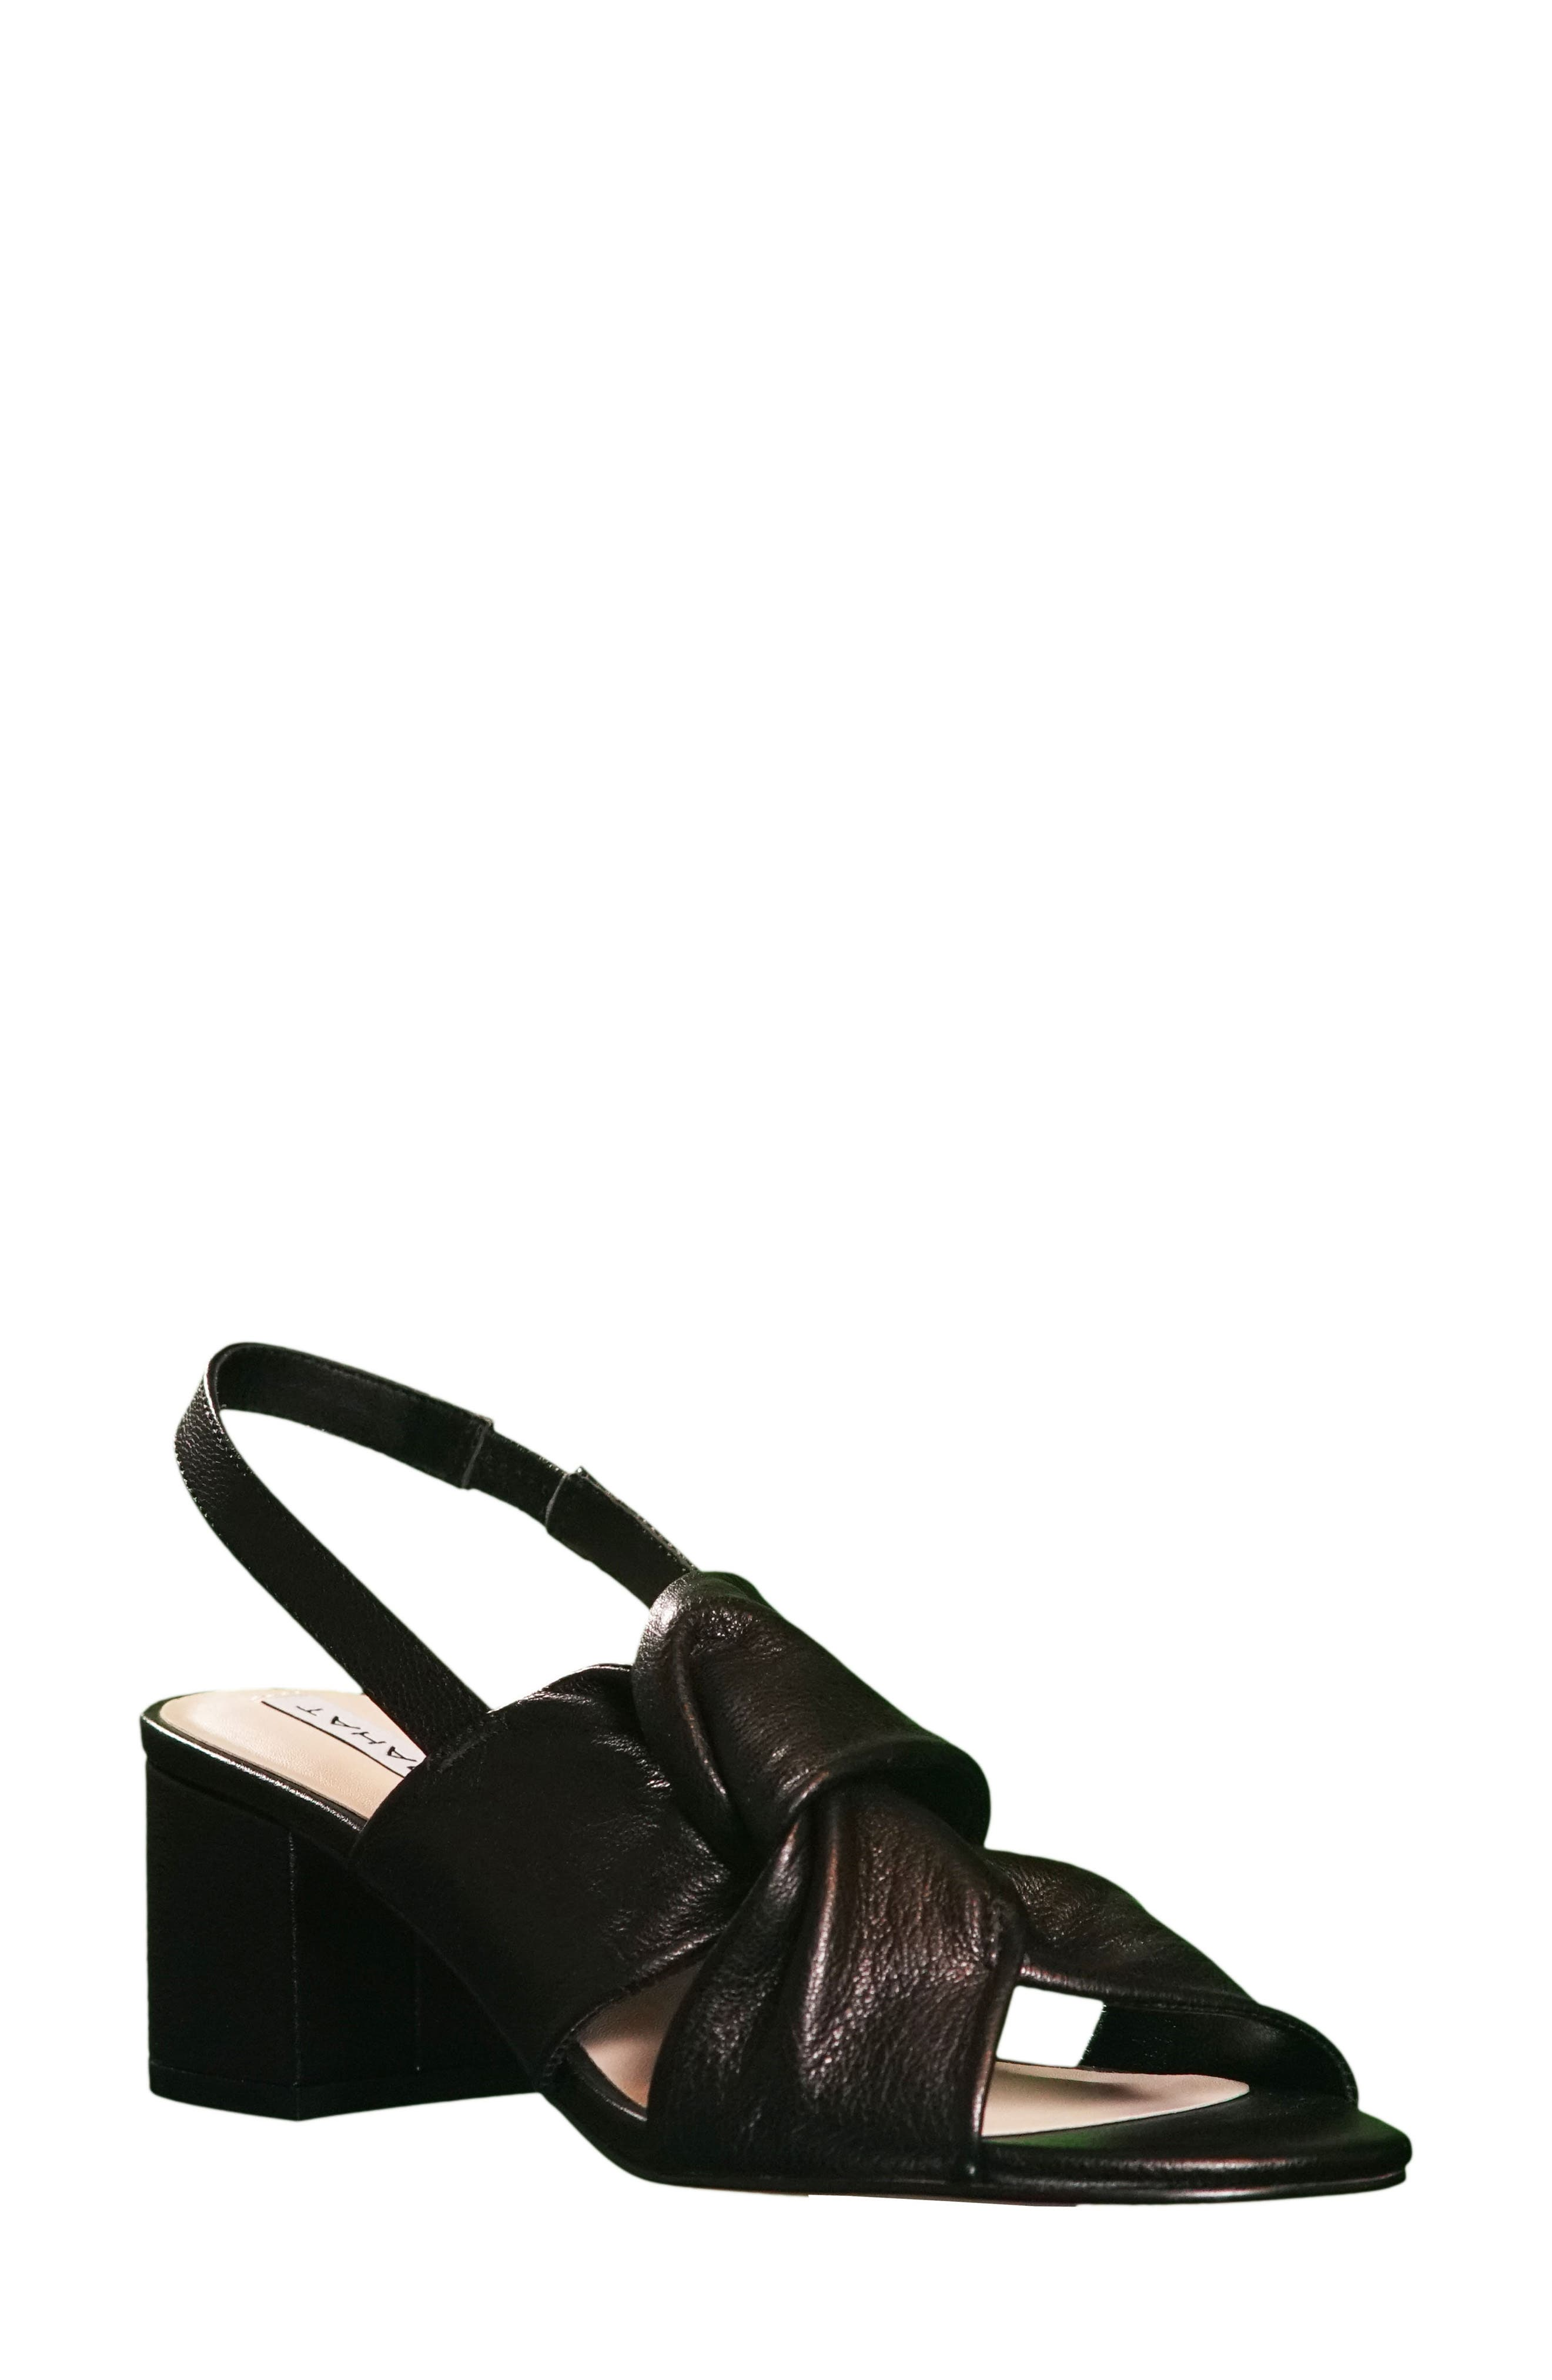 77d4515ef74 Women s T Tahari Shoes